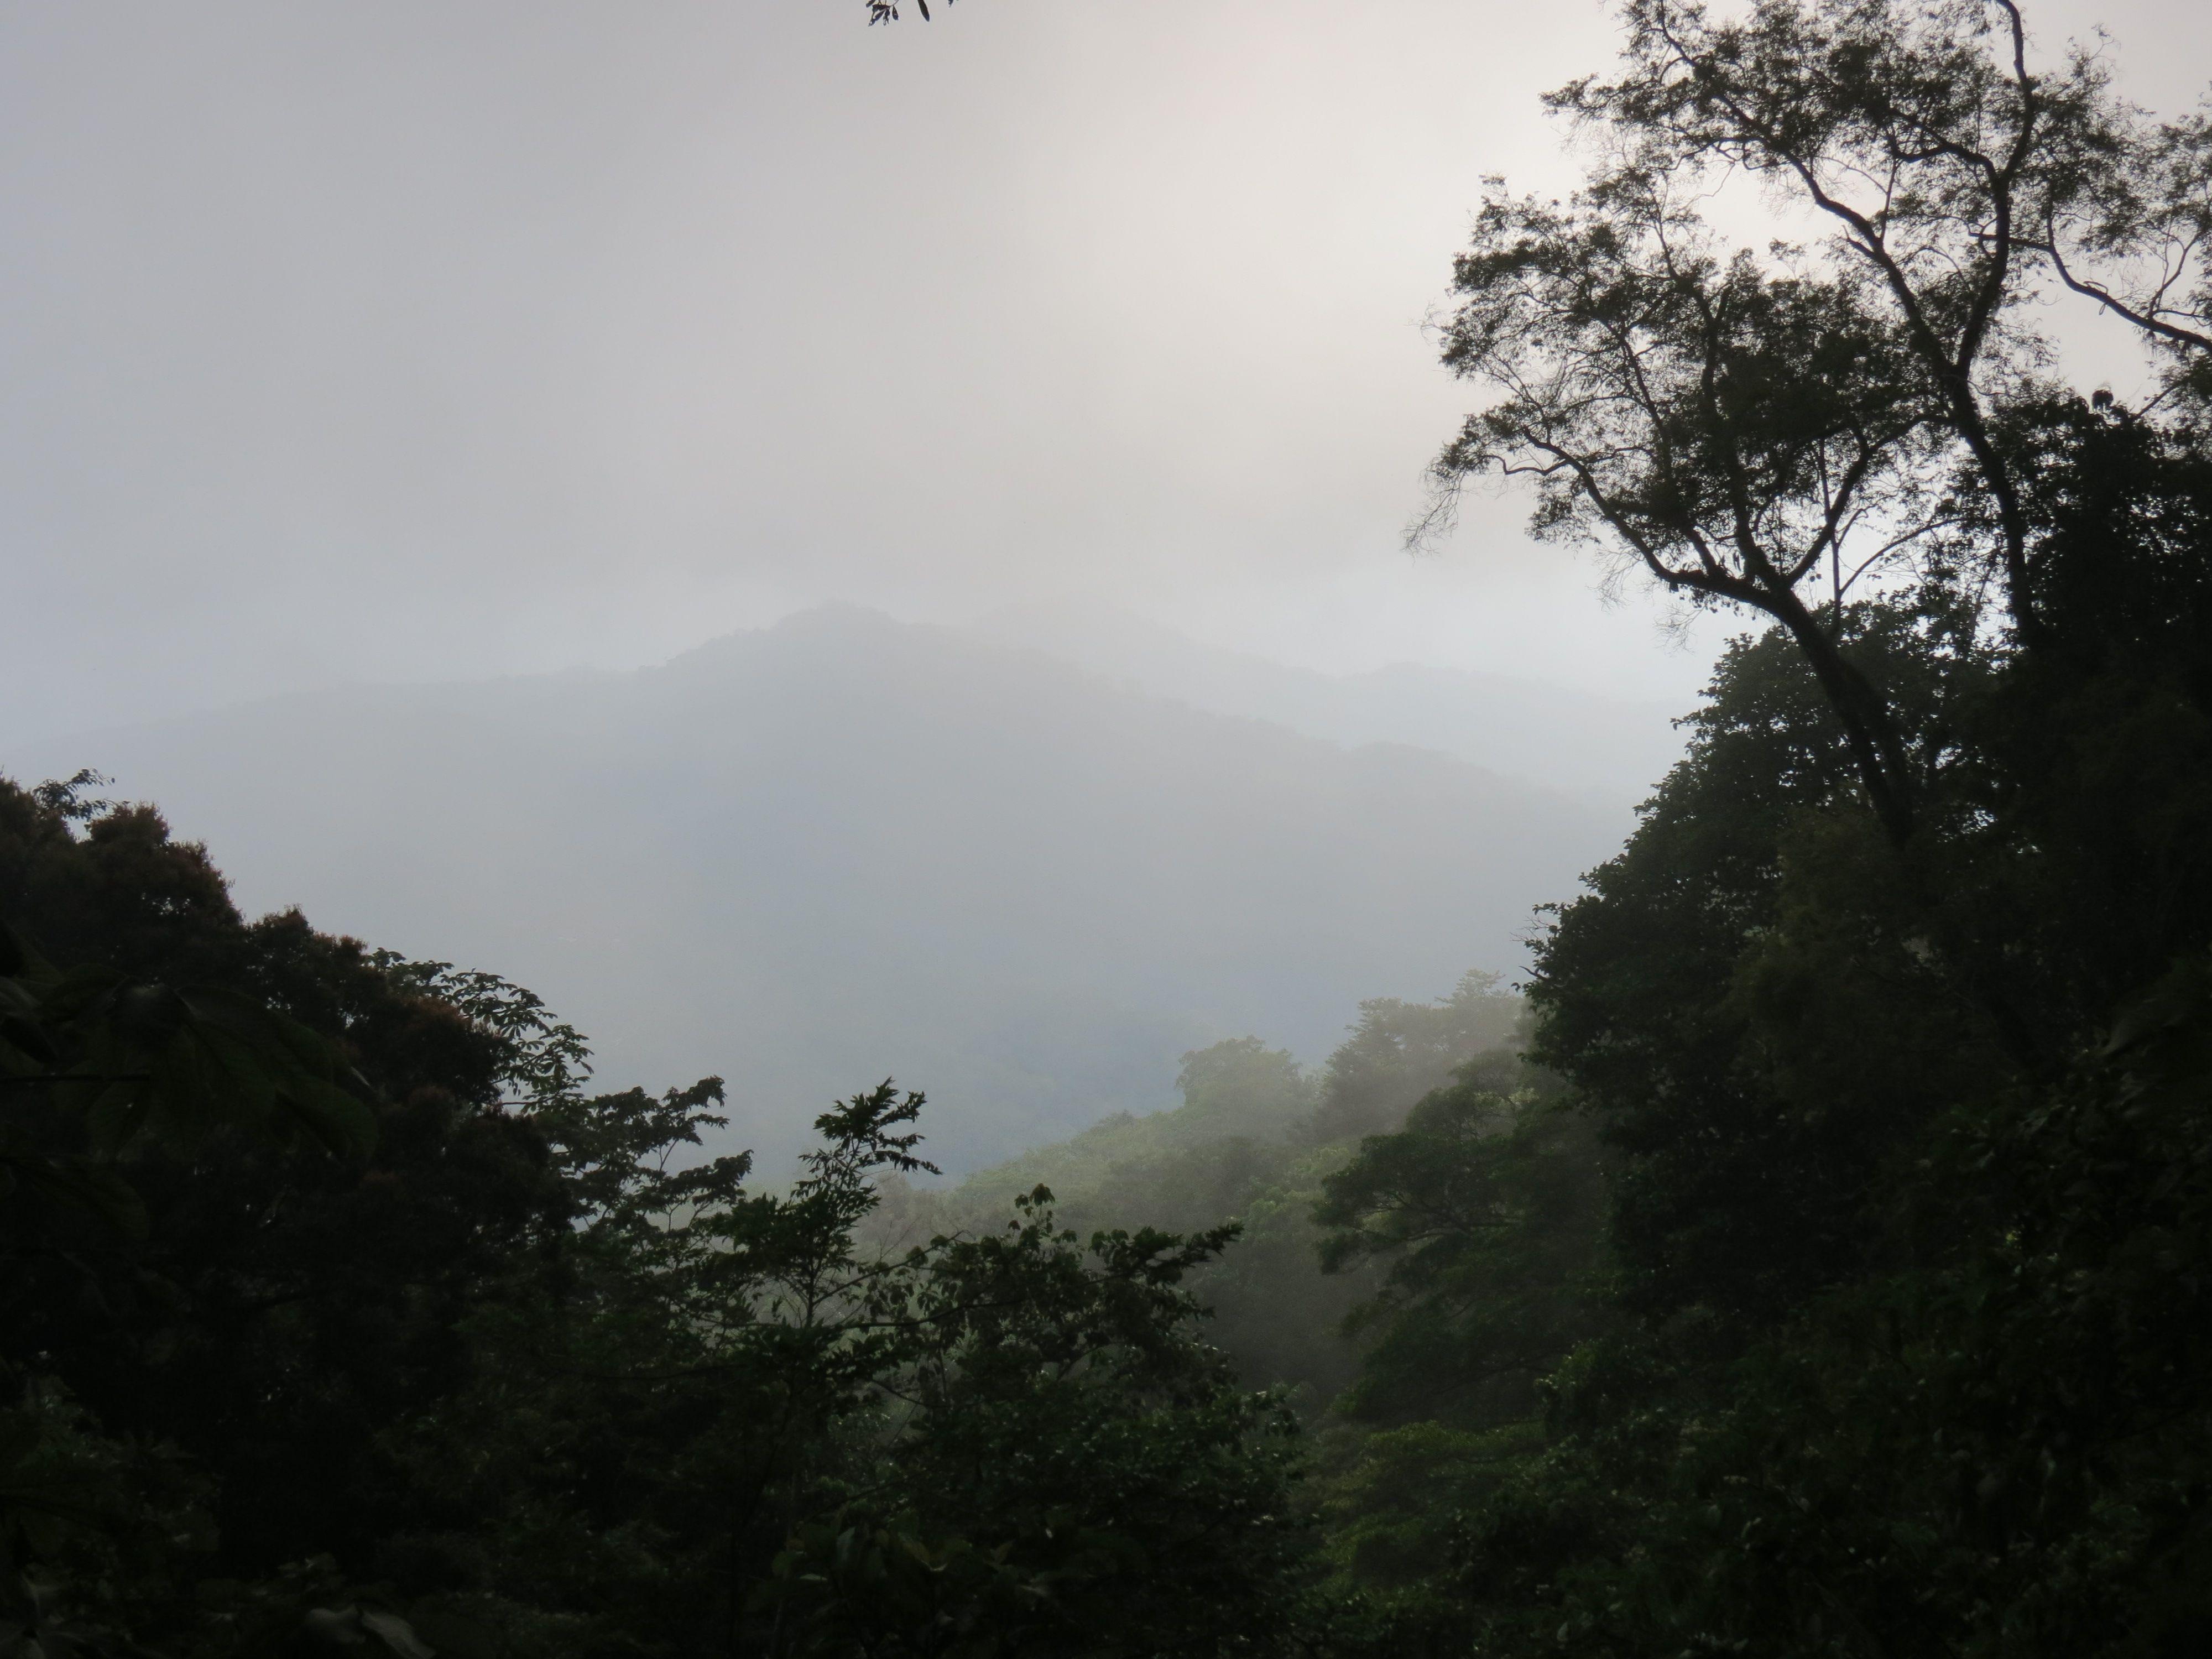 Cloud forest oaxaca mexico mexico oaxaca mexico clouds